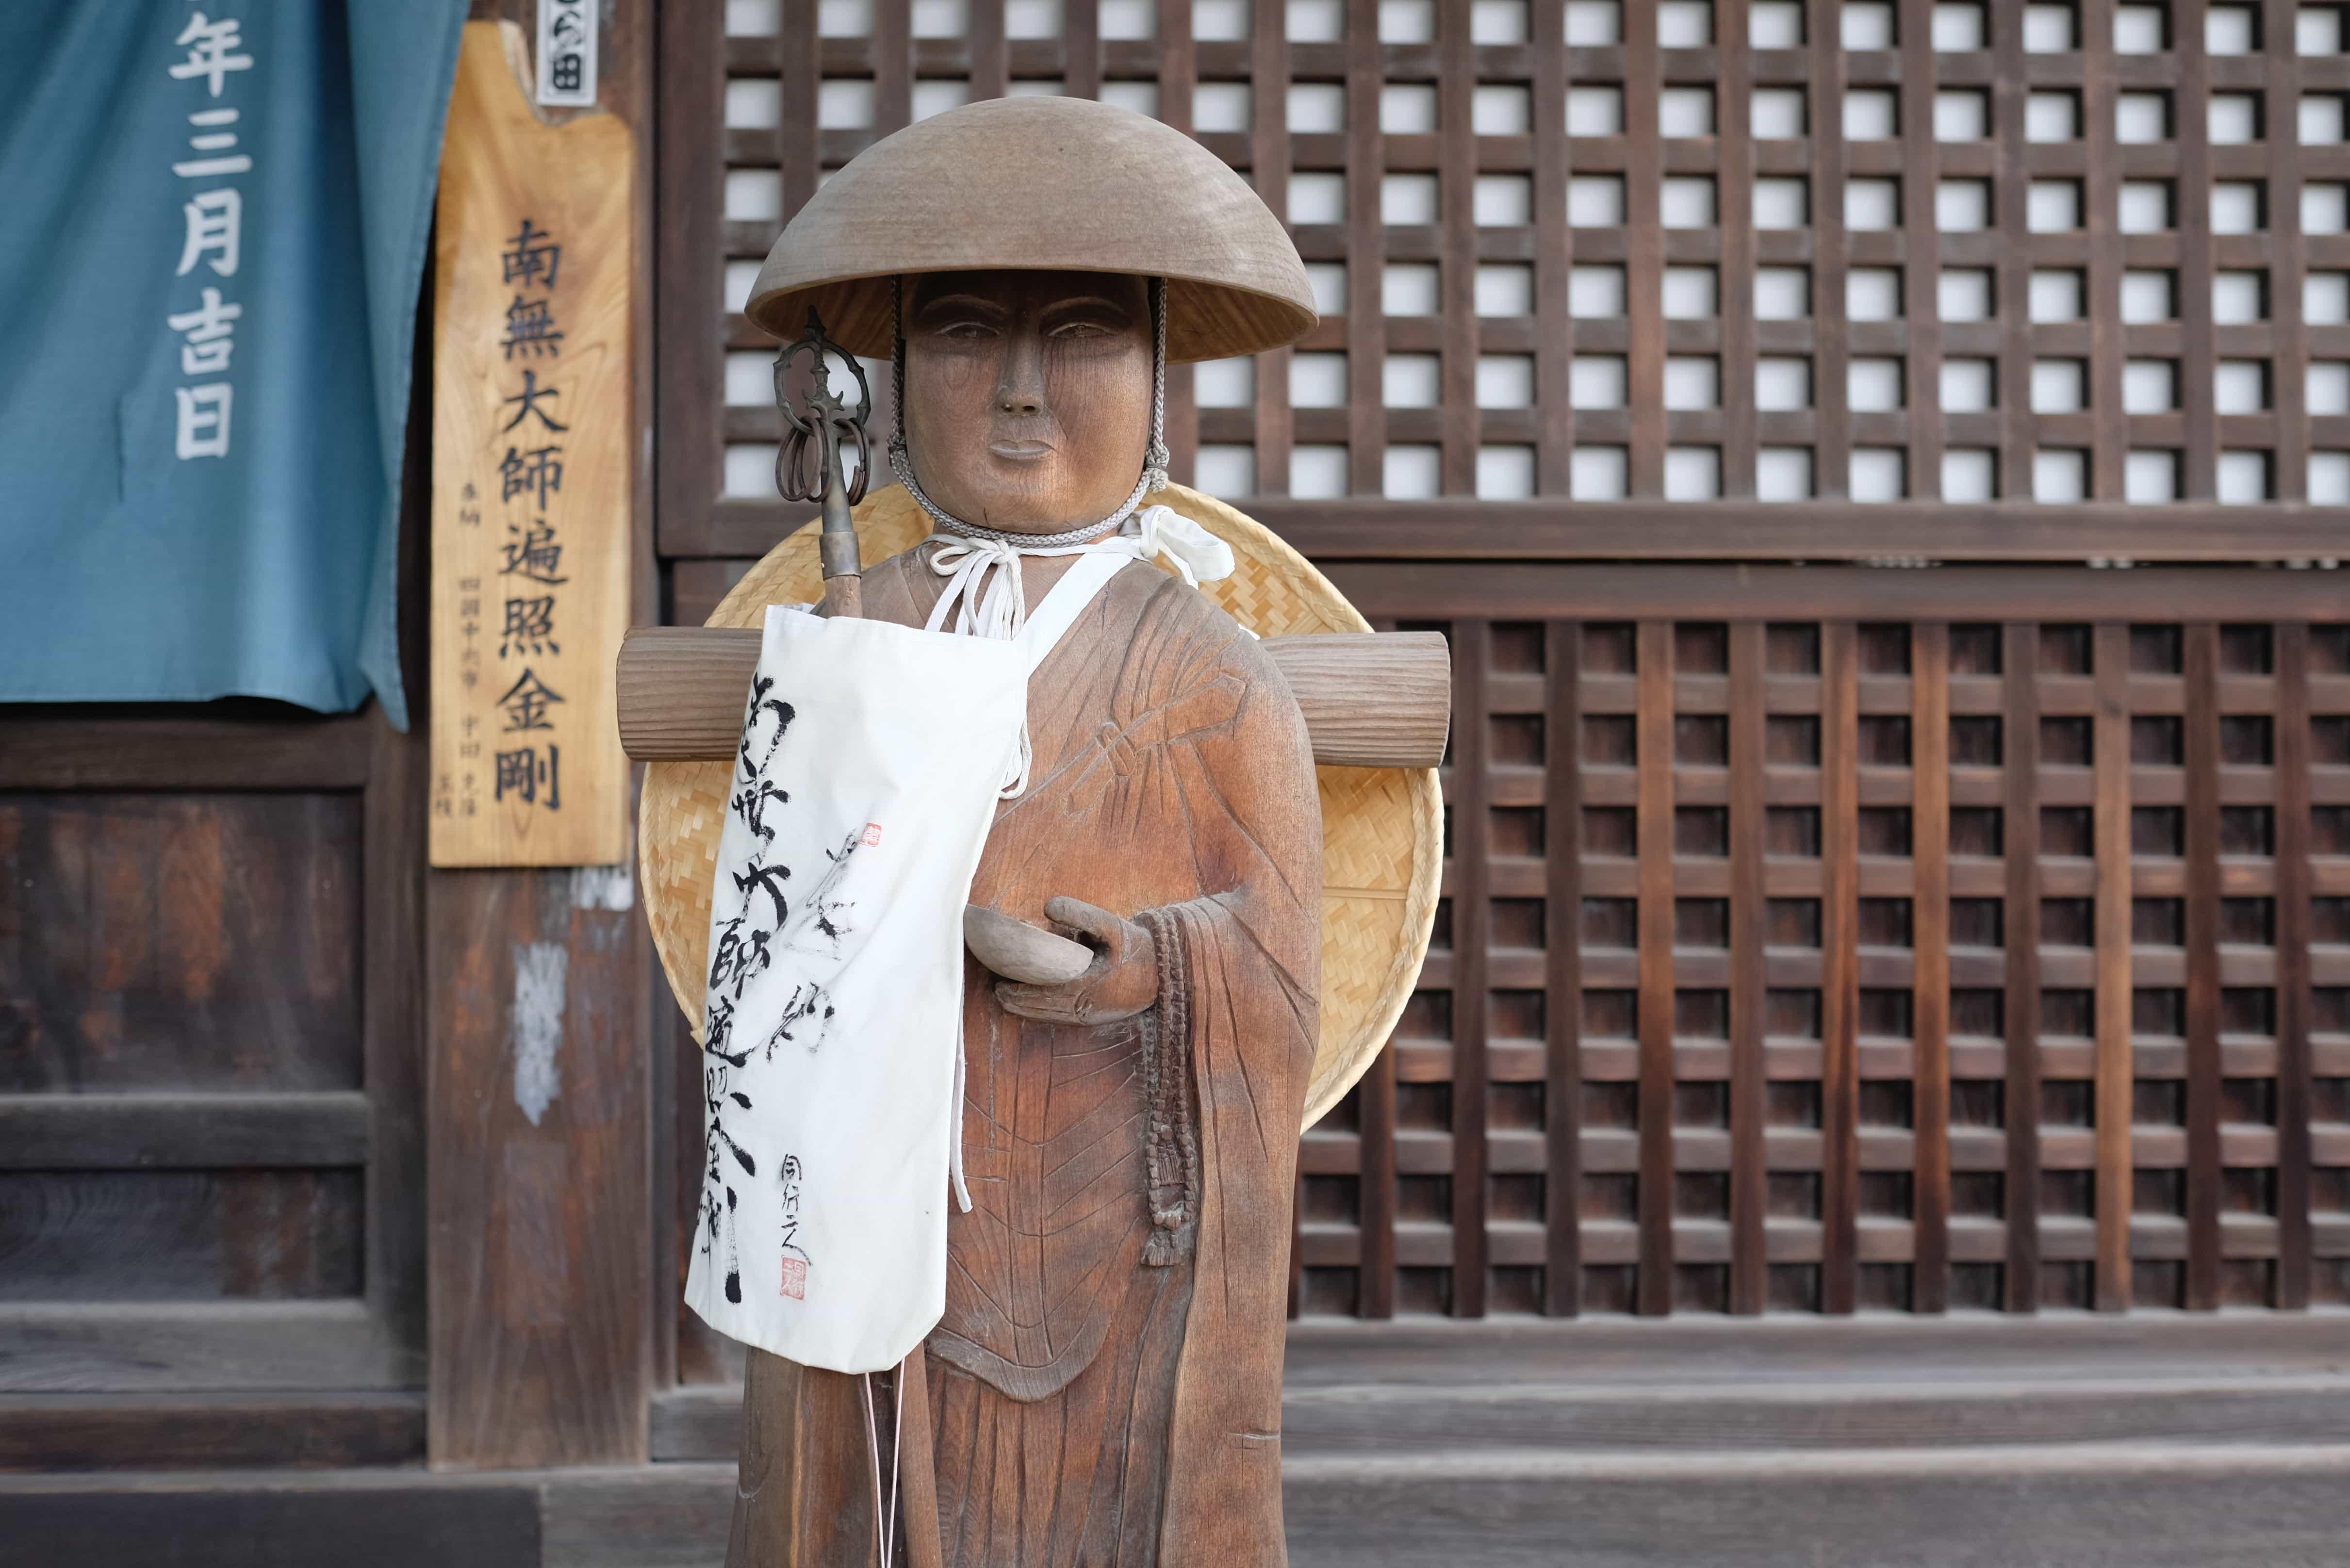 Wooden Kobo Daishi